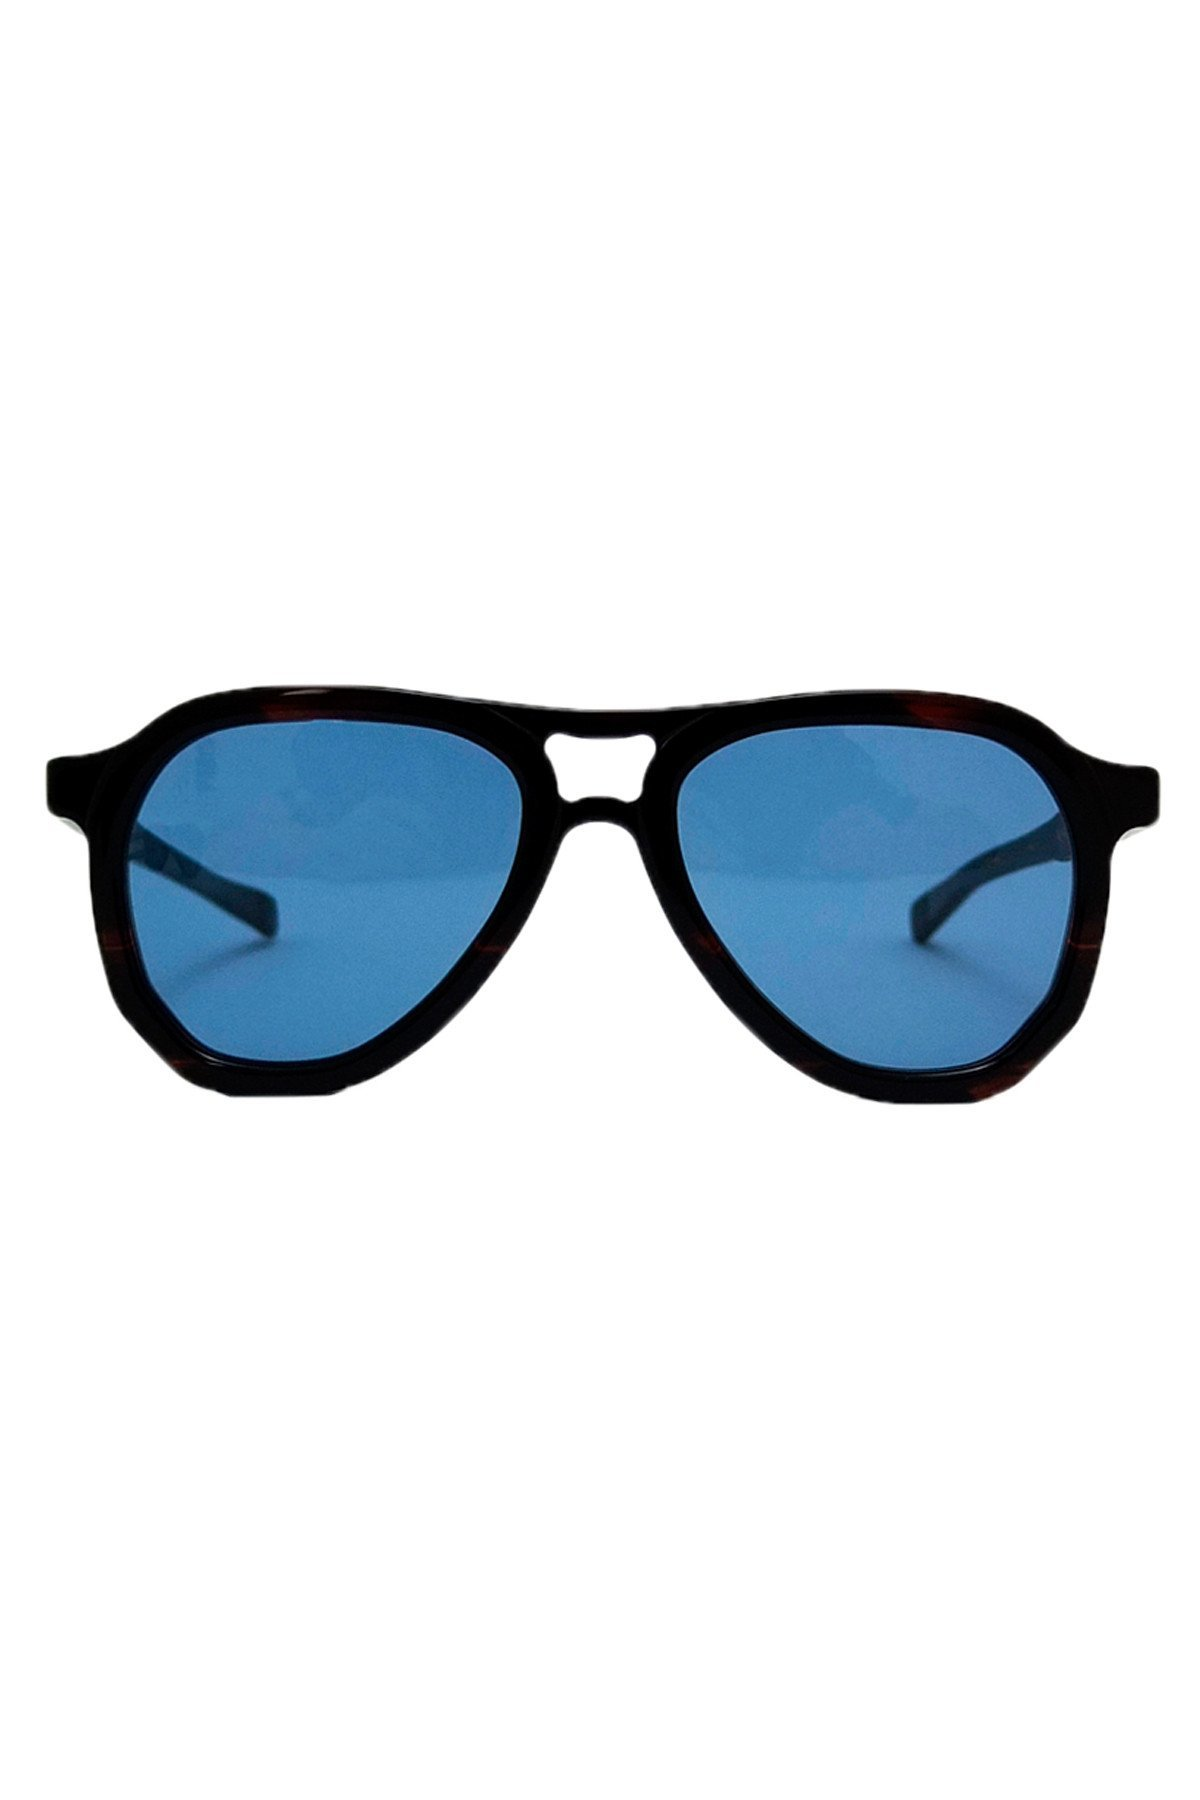 Glasses Frames Kingston : Max Pittion Kingston Sunglasses - Beer Sasa Garmentory